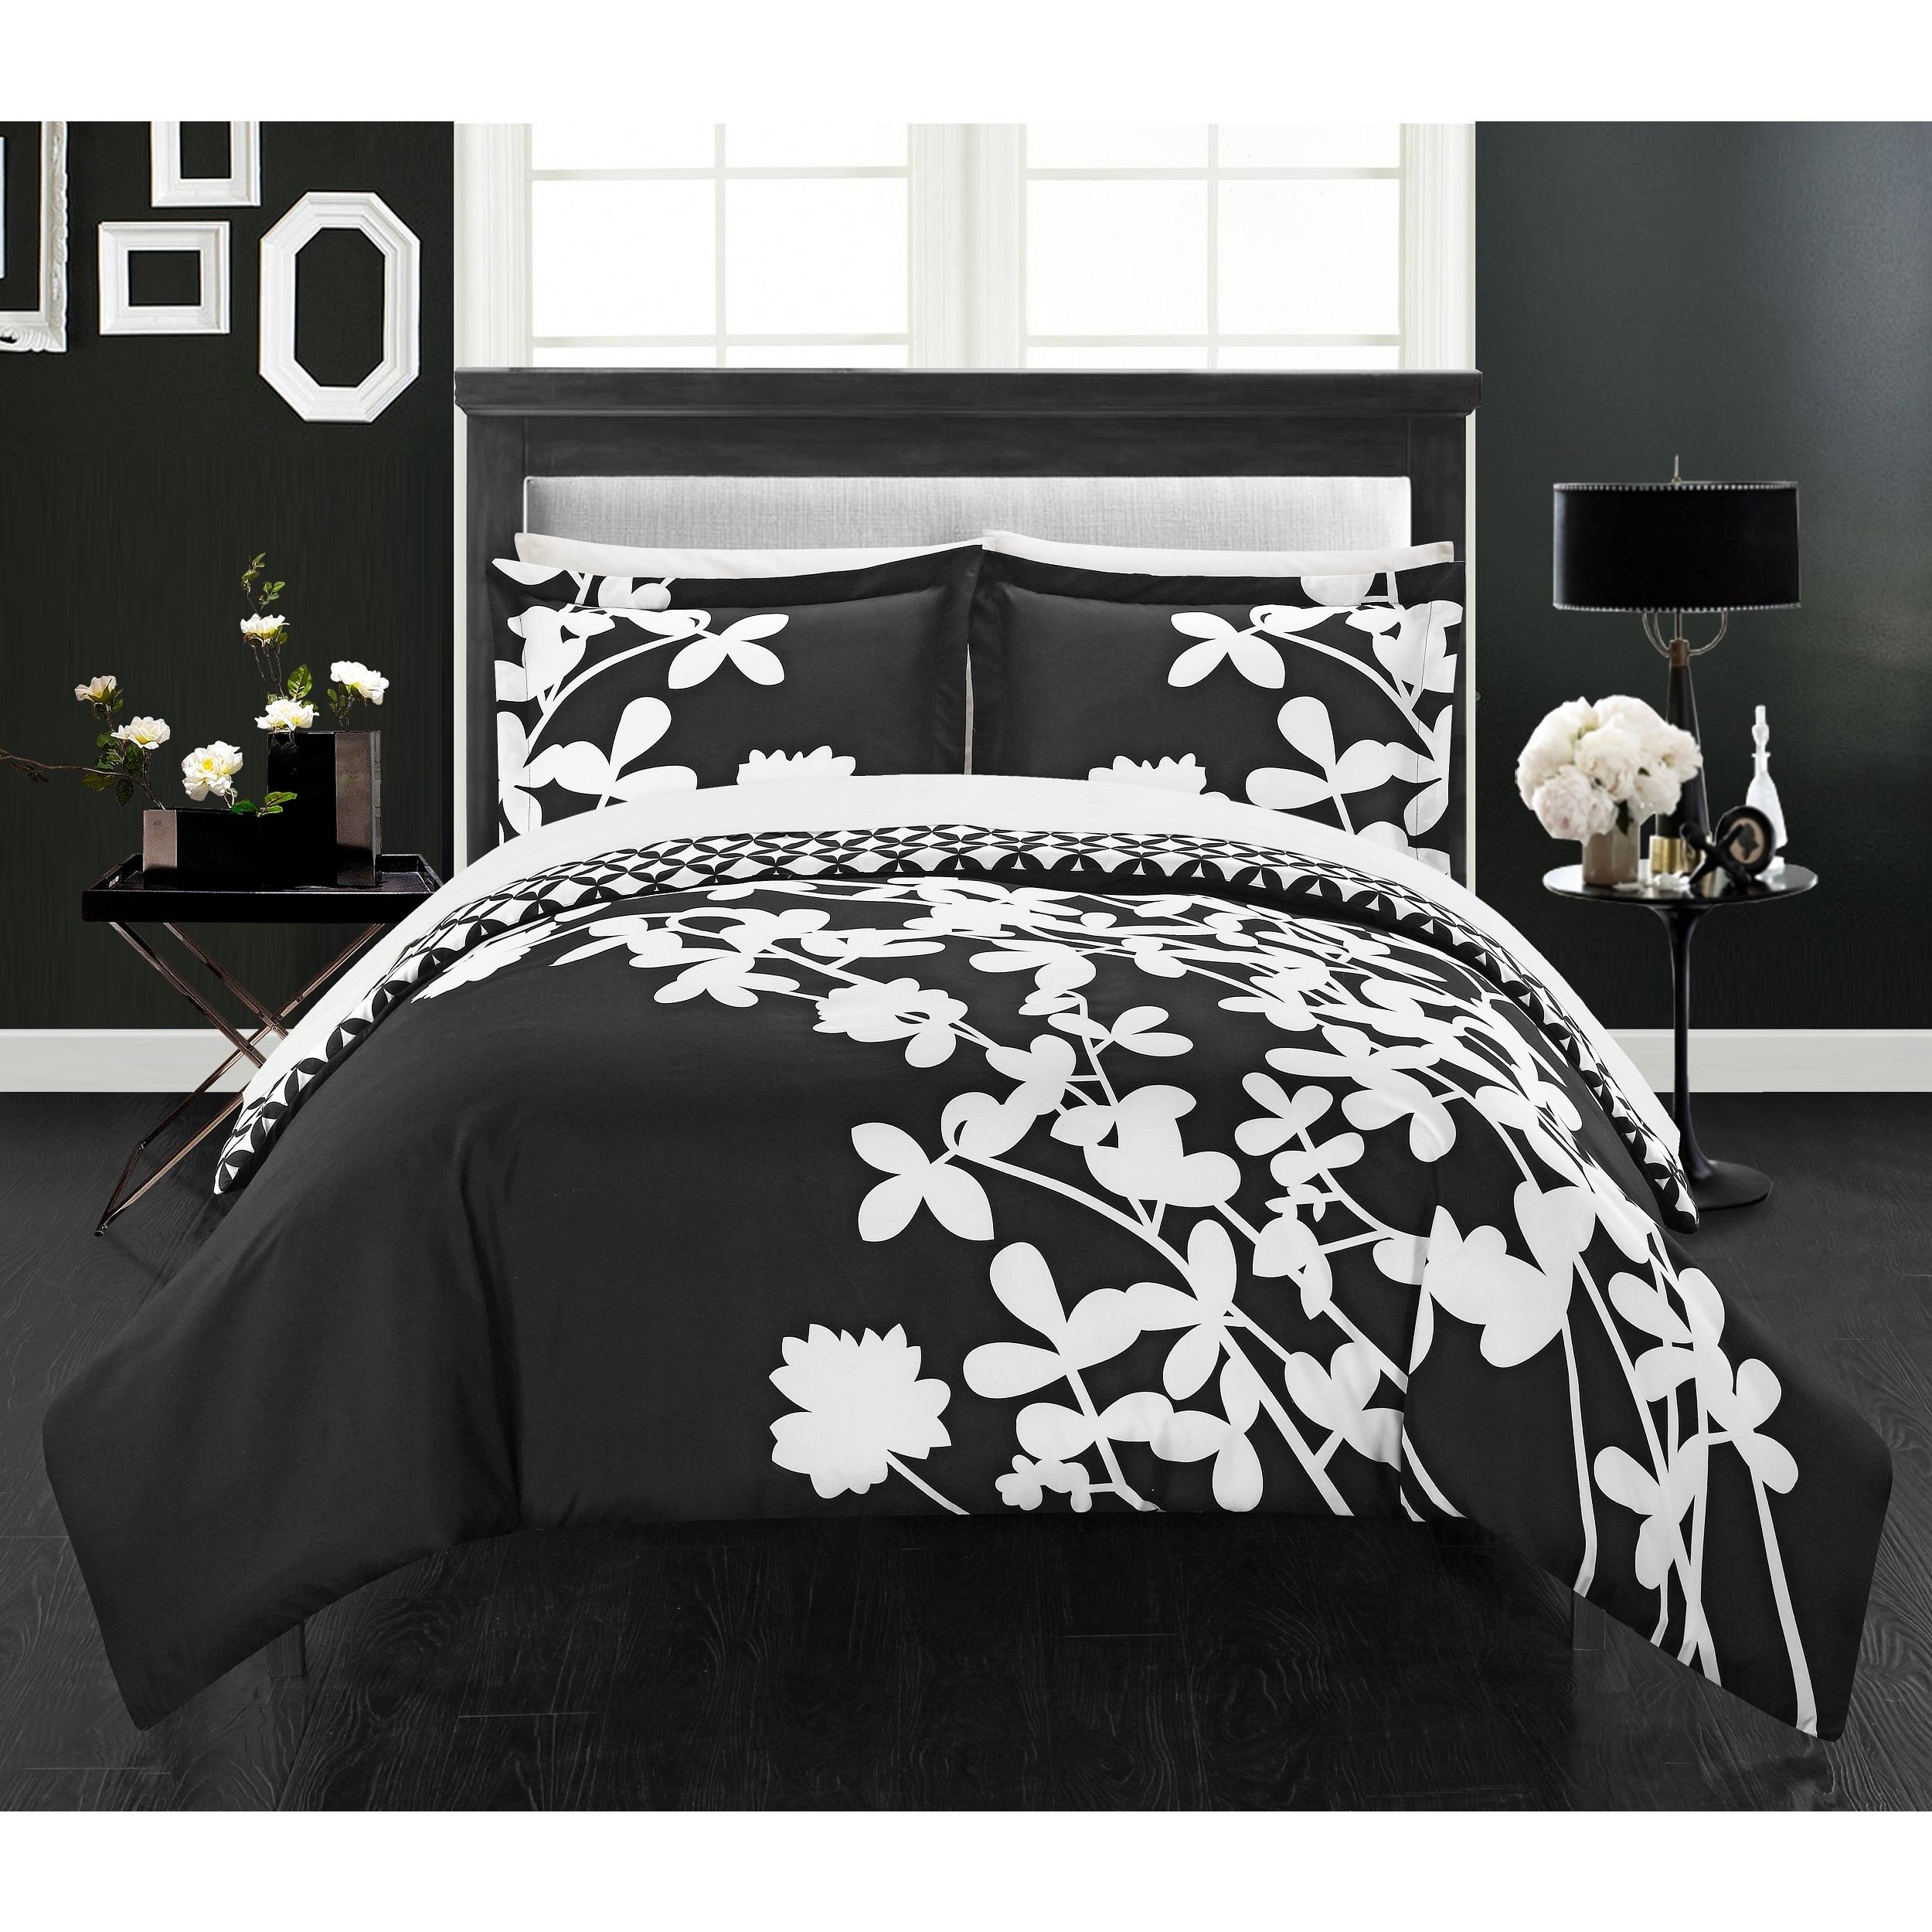 Chic Home Casa Blanca Black Reversible 3-Piece Duvet Cover Set